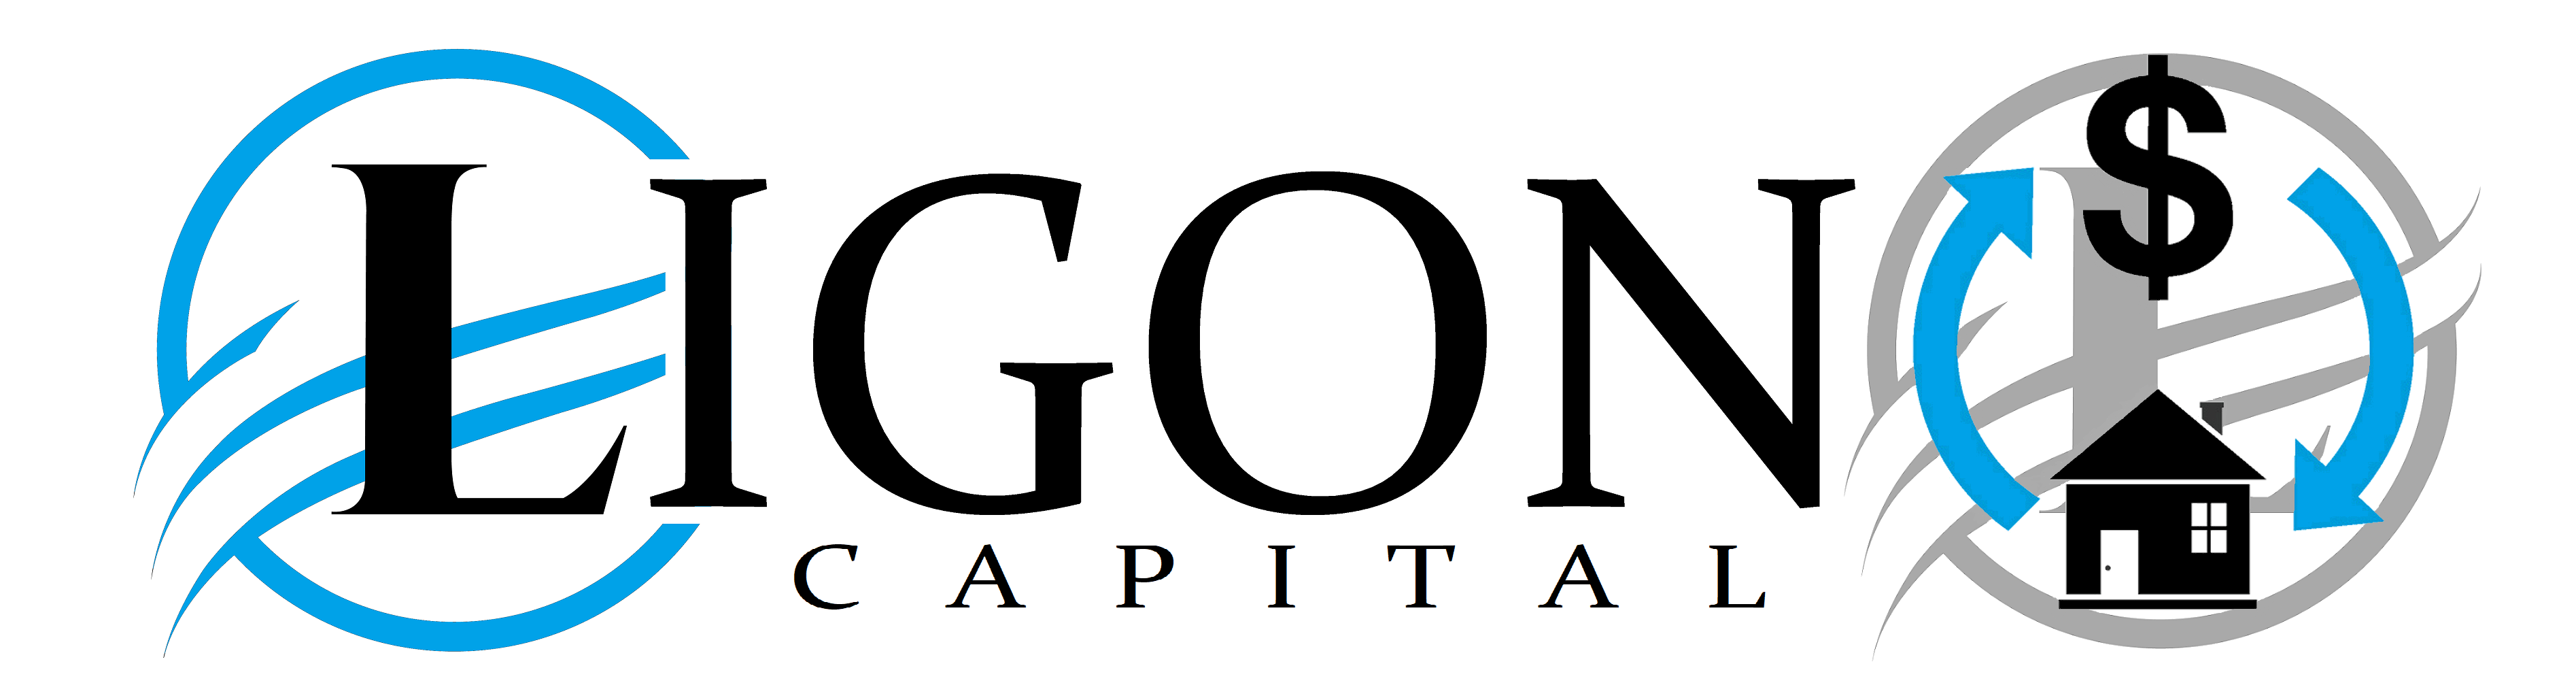 Ligon Capital - Real Estate Investing Alternatives